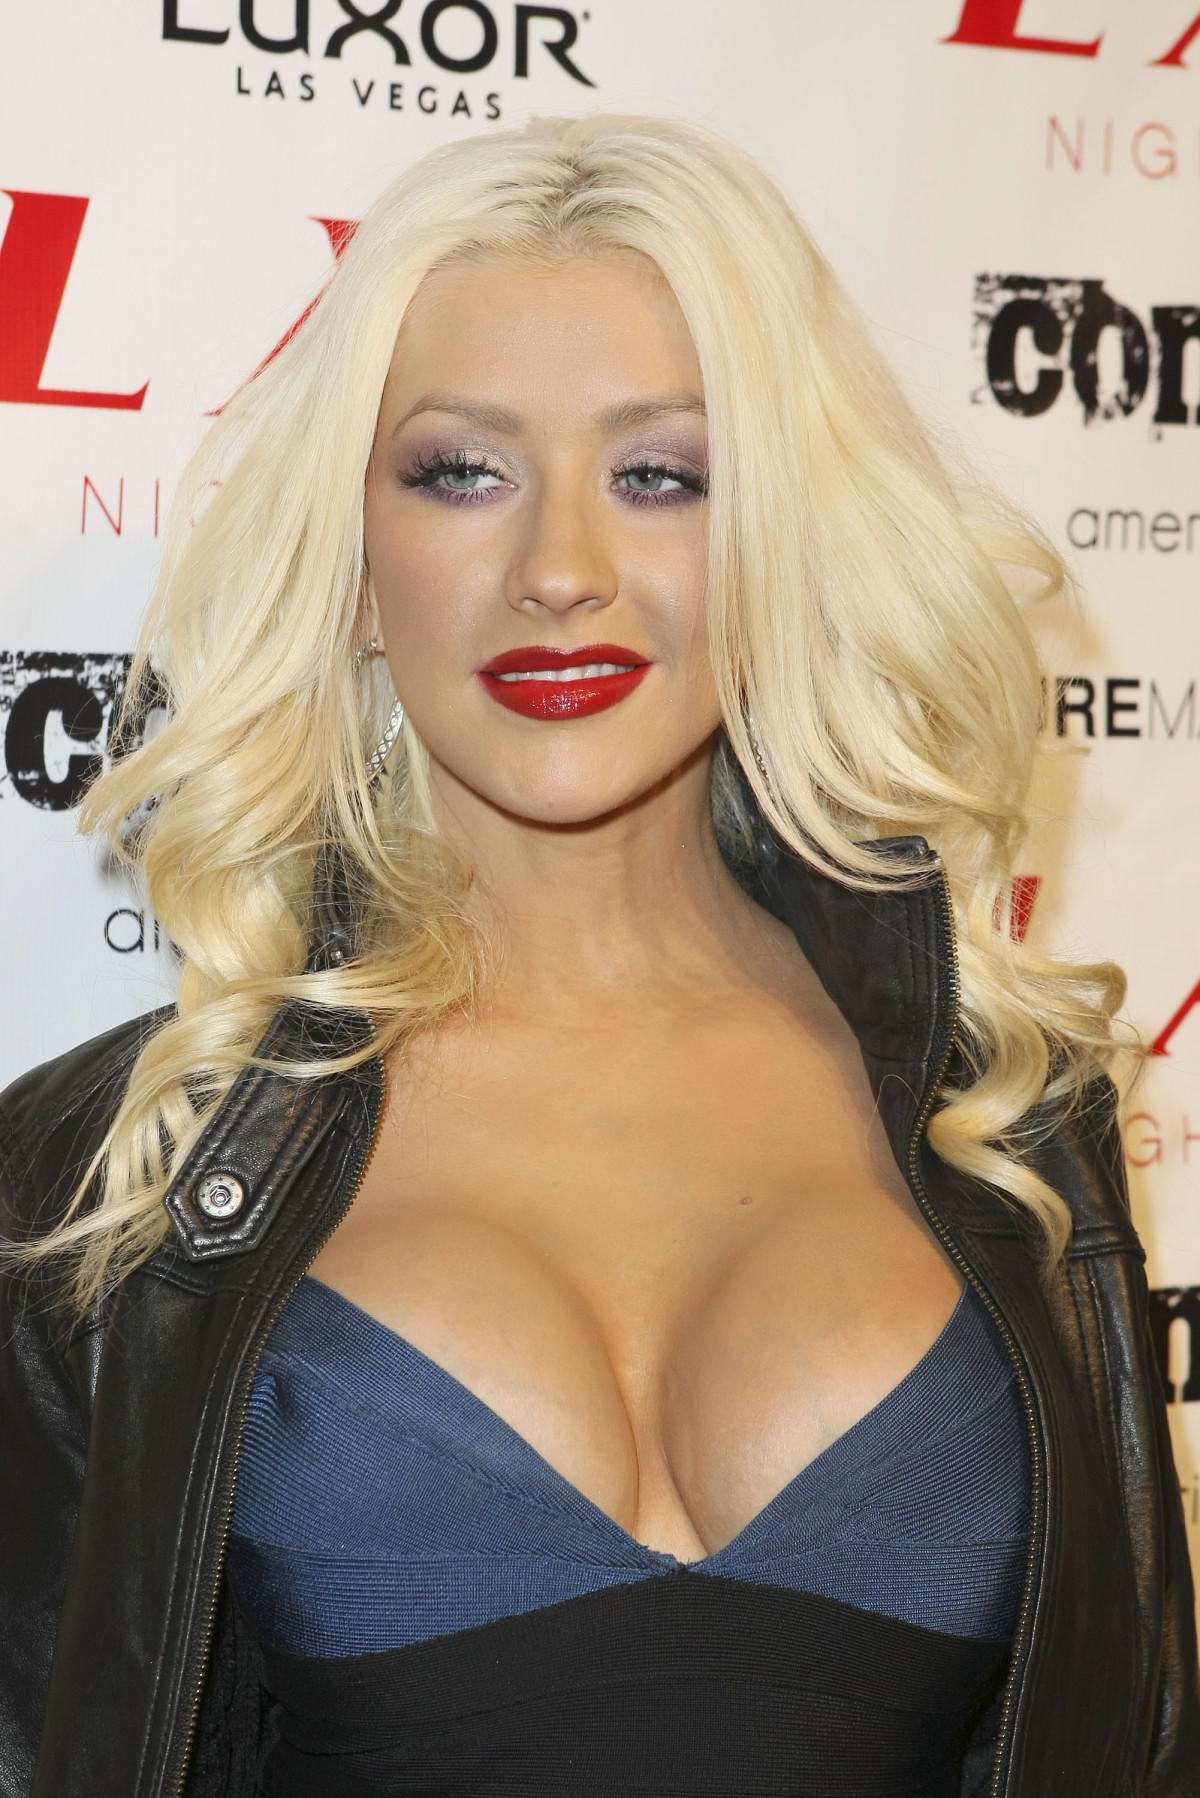 Christina Aguilera Bikini Pictures